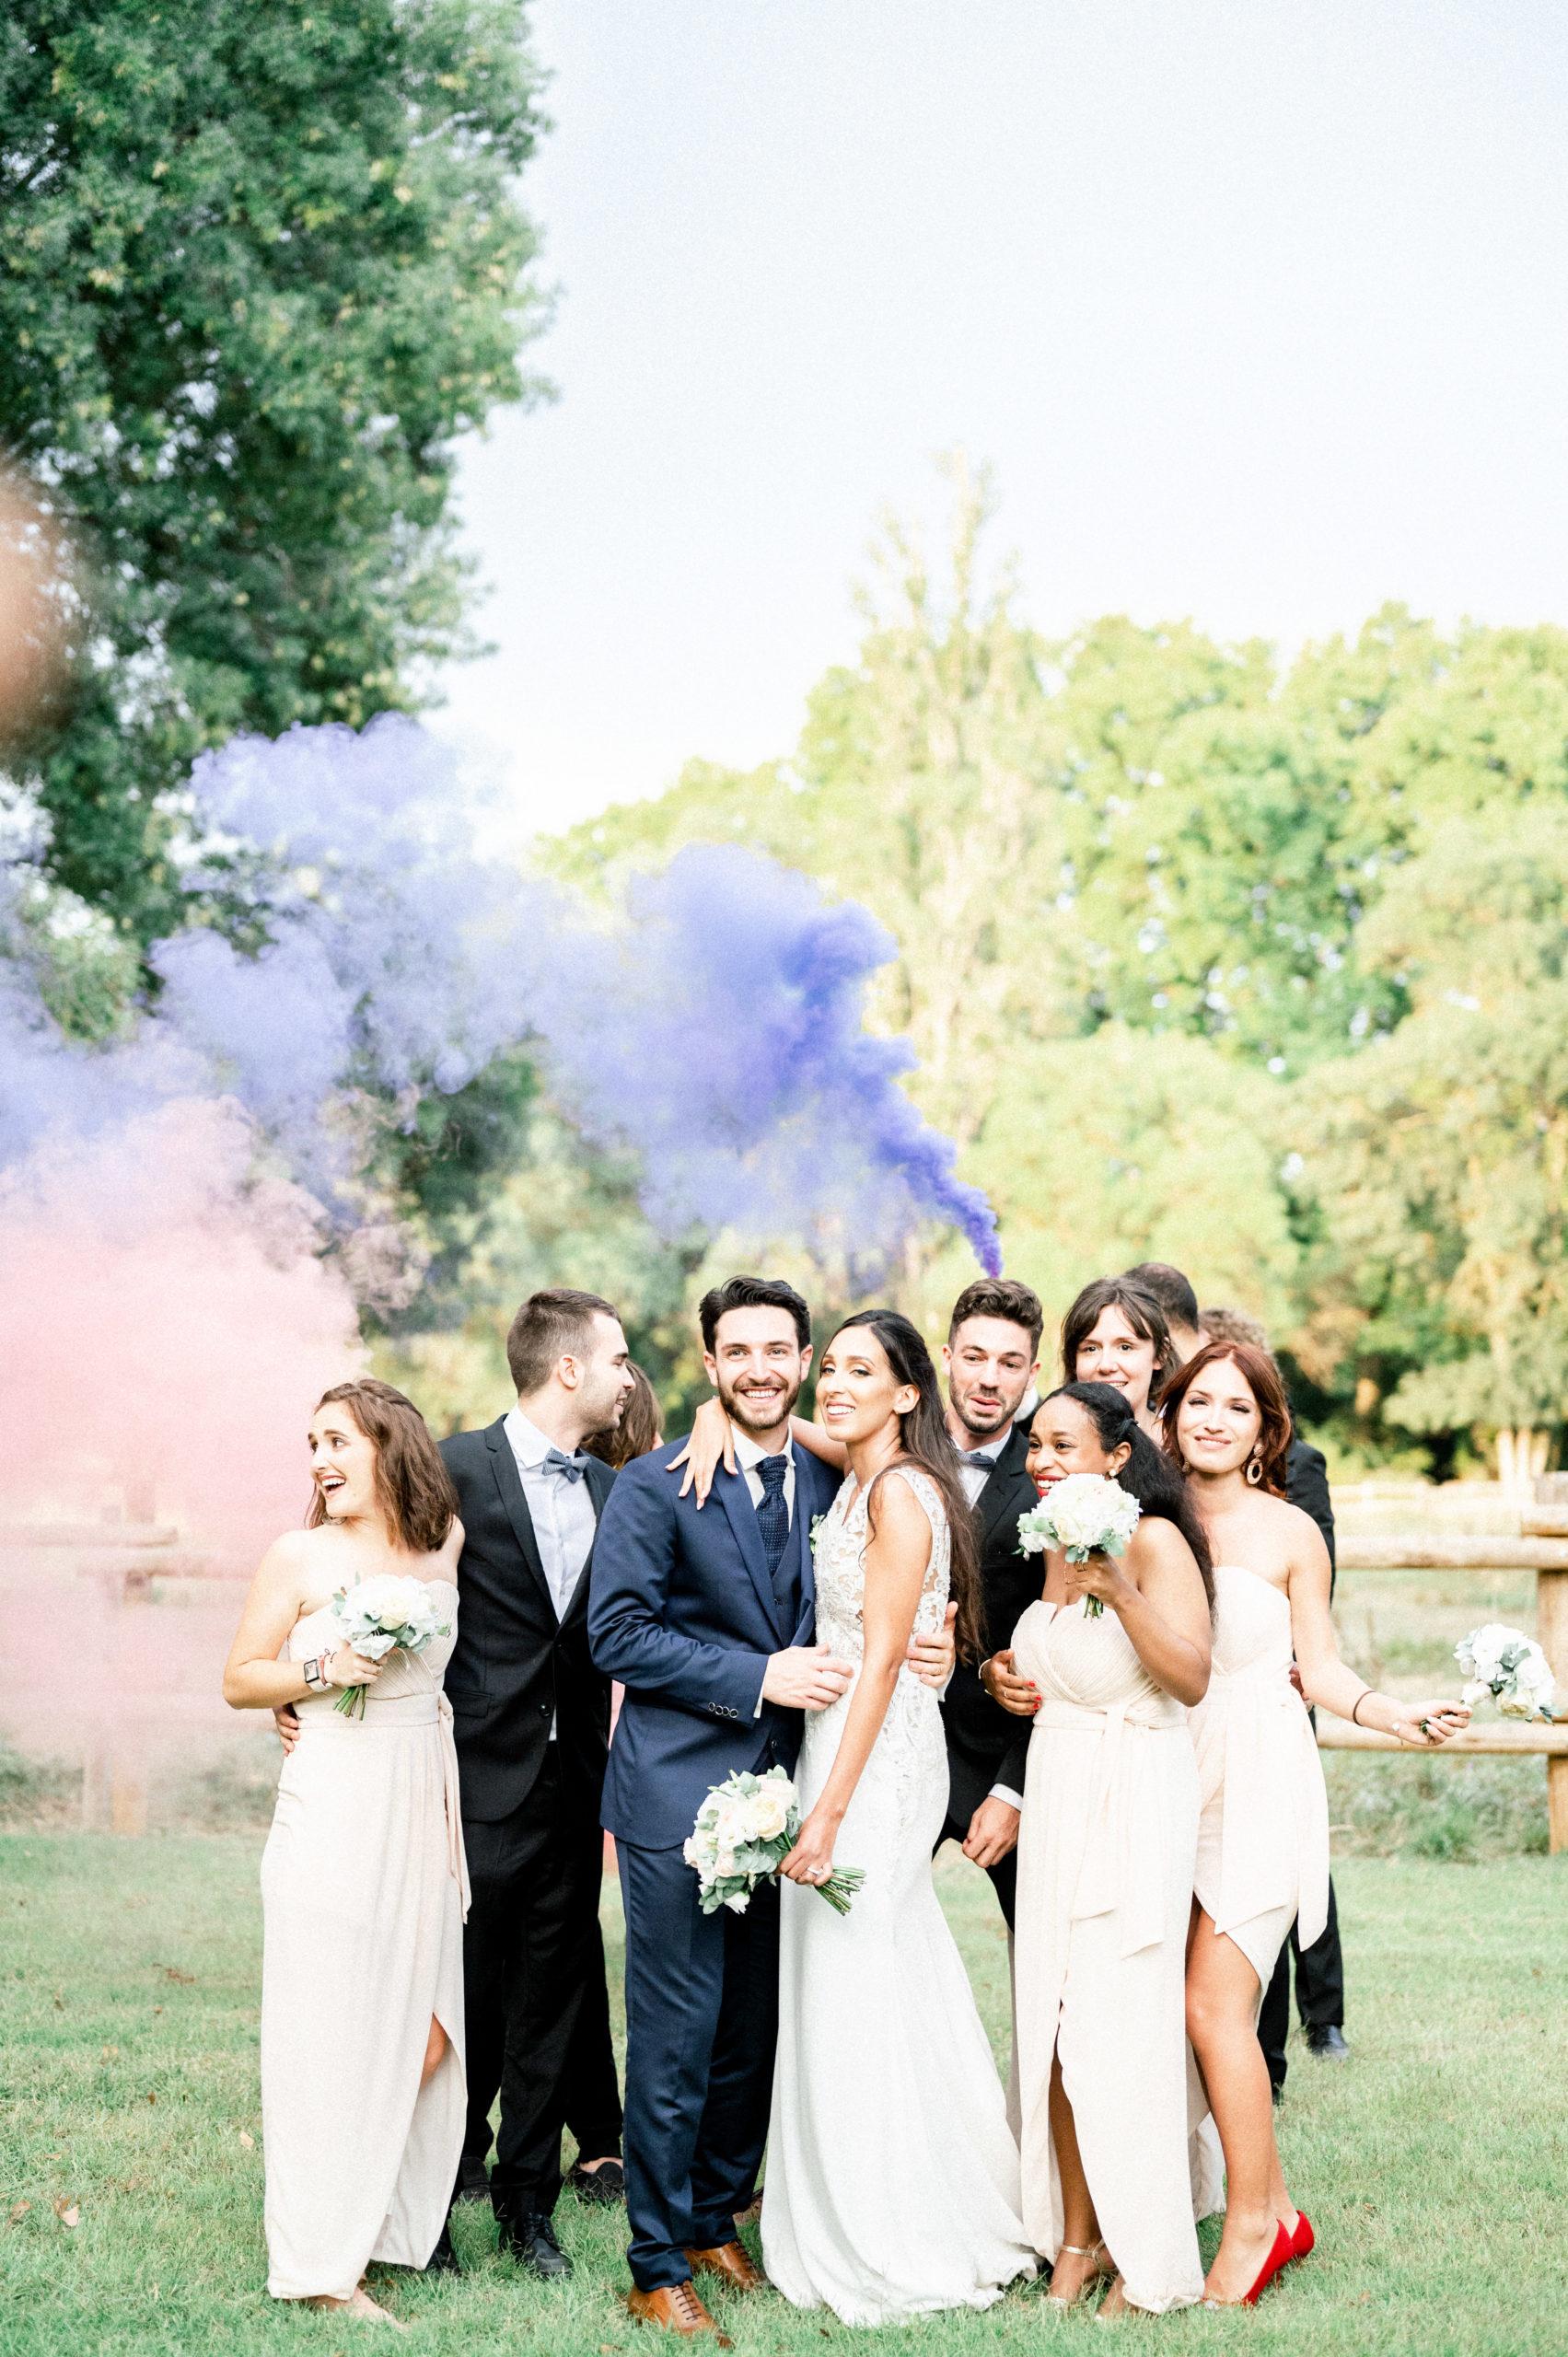 Mariage à Montpellier Sylvia Calmet photographe de mariage